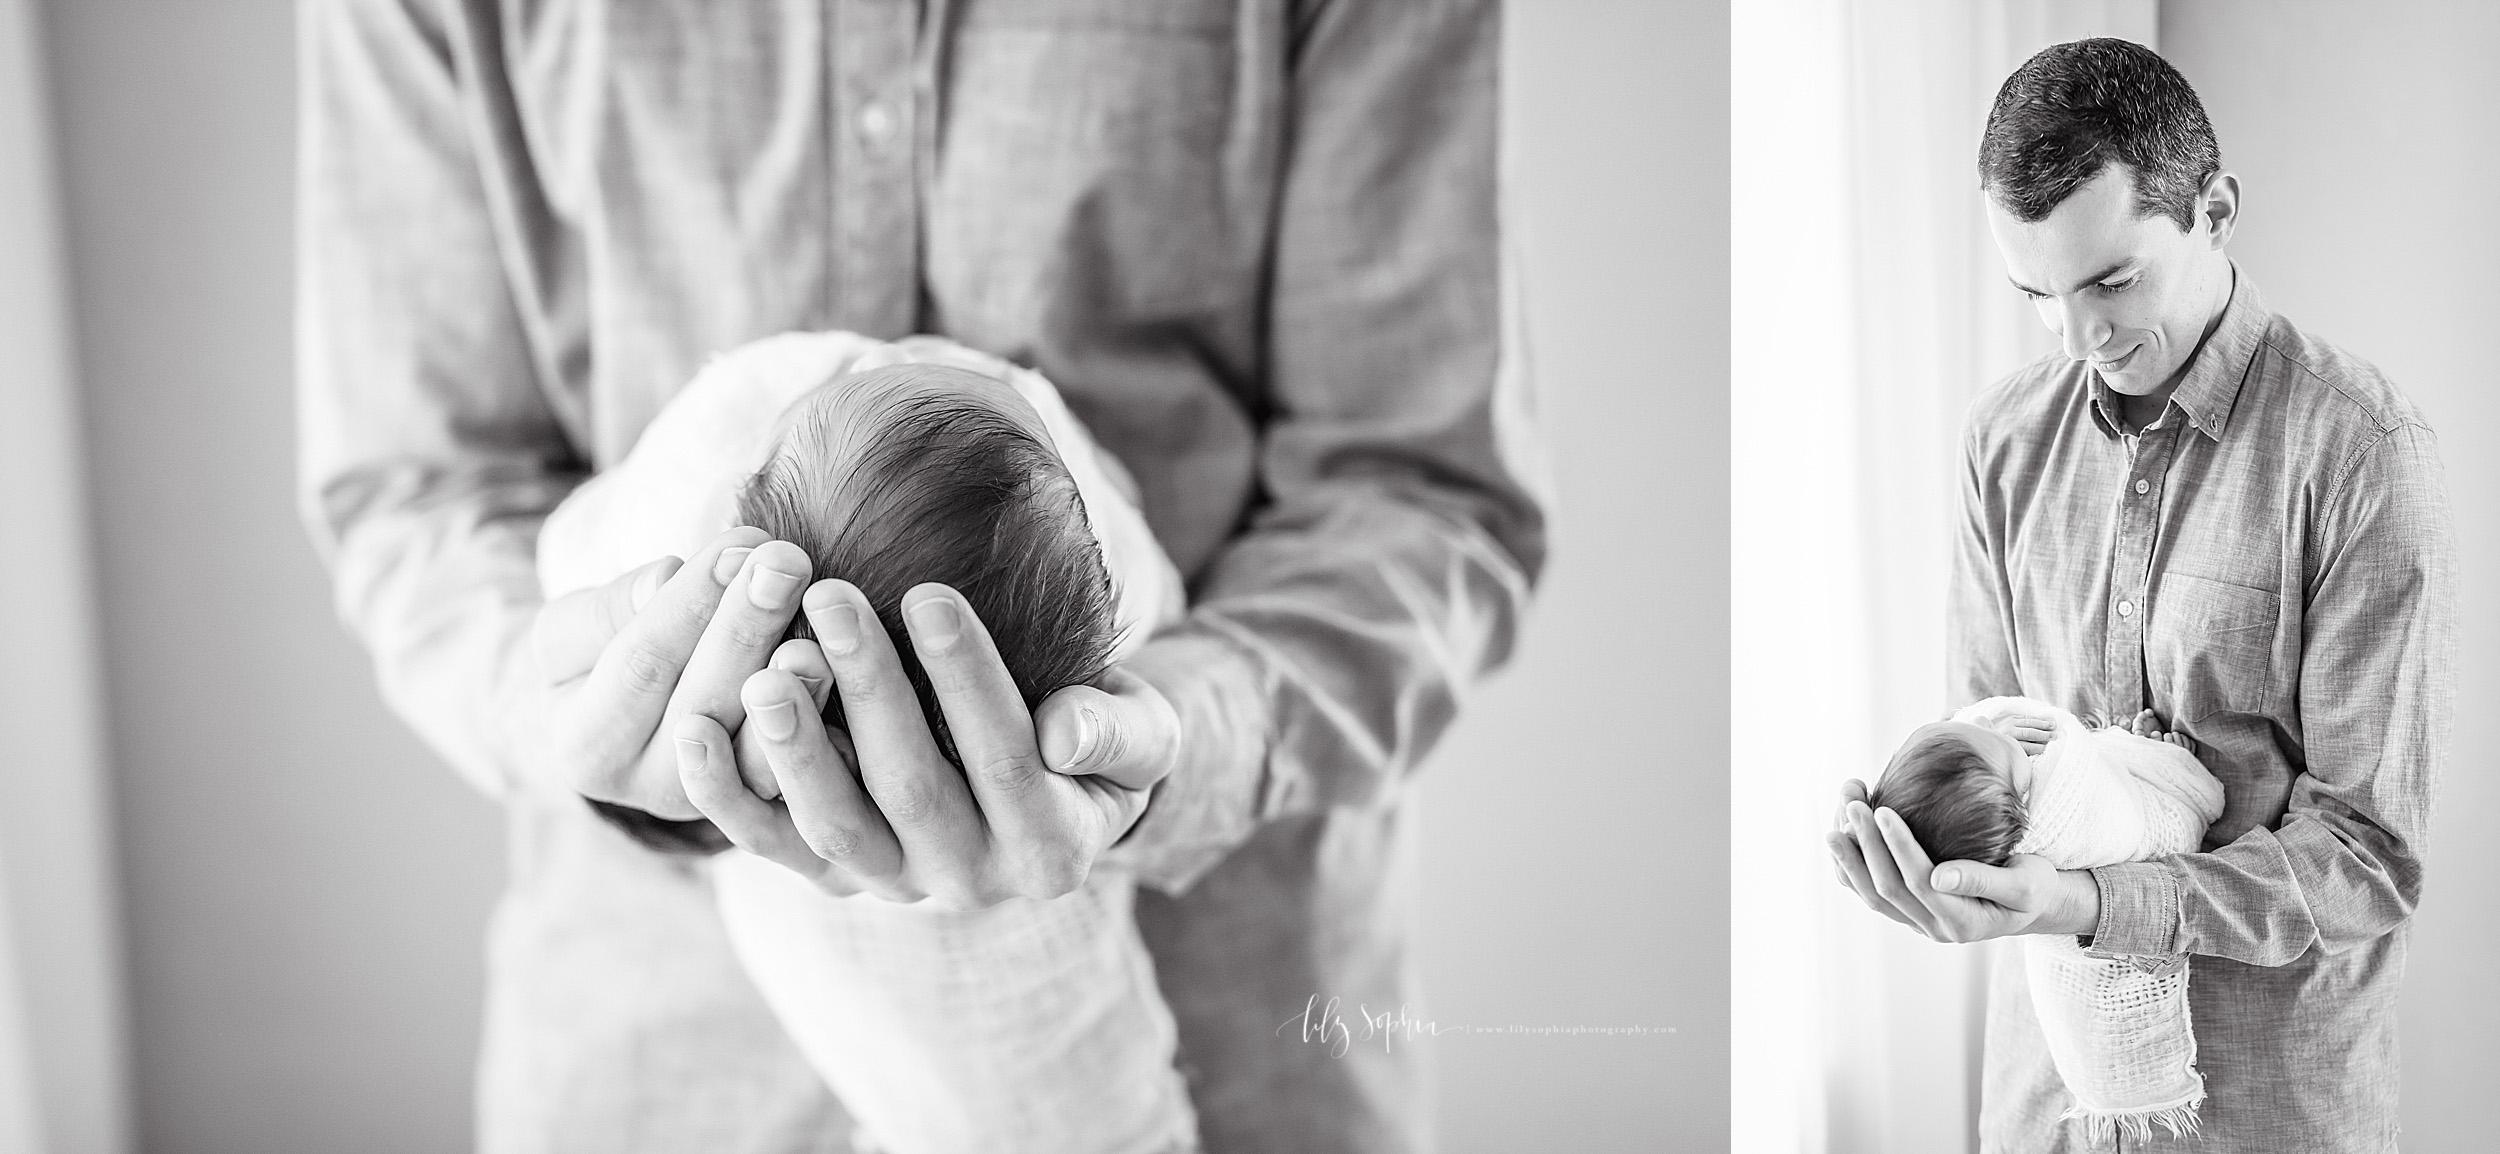 atlanta-brookhaven-decatur-sandy-springs-buckhead-virginia-highlands-west-end-decatur-lily-sophia-photography-ukraine-family-newborn-baby-boy-studio-photos_1504.jpg